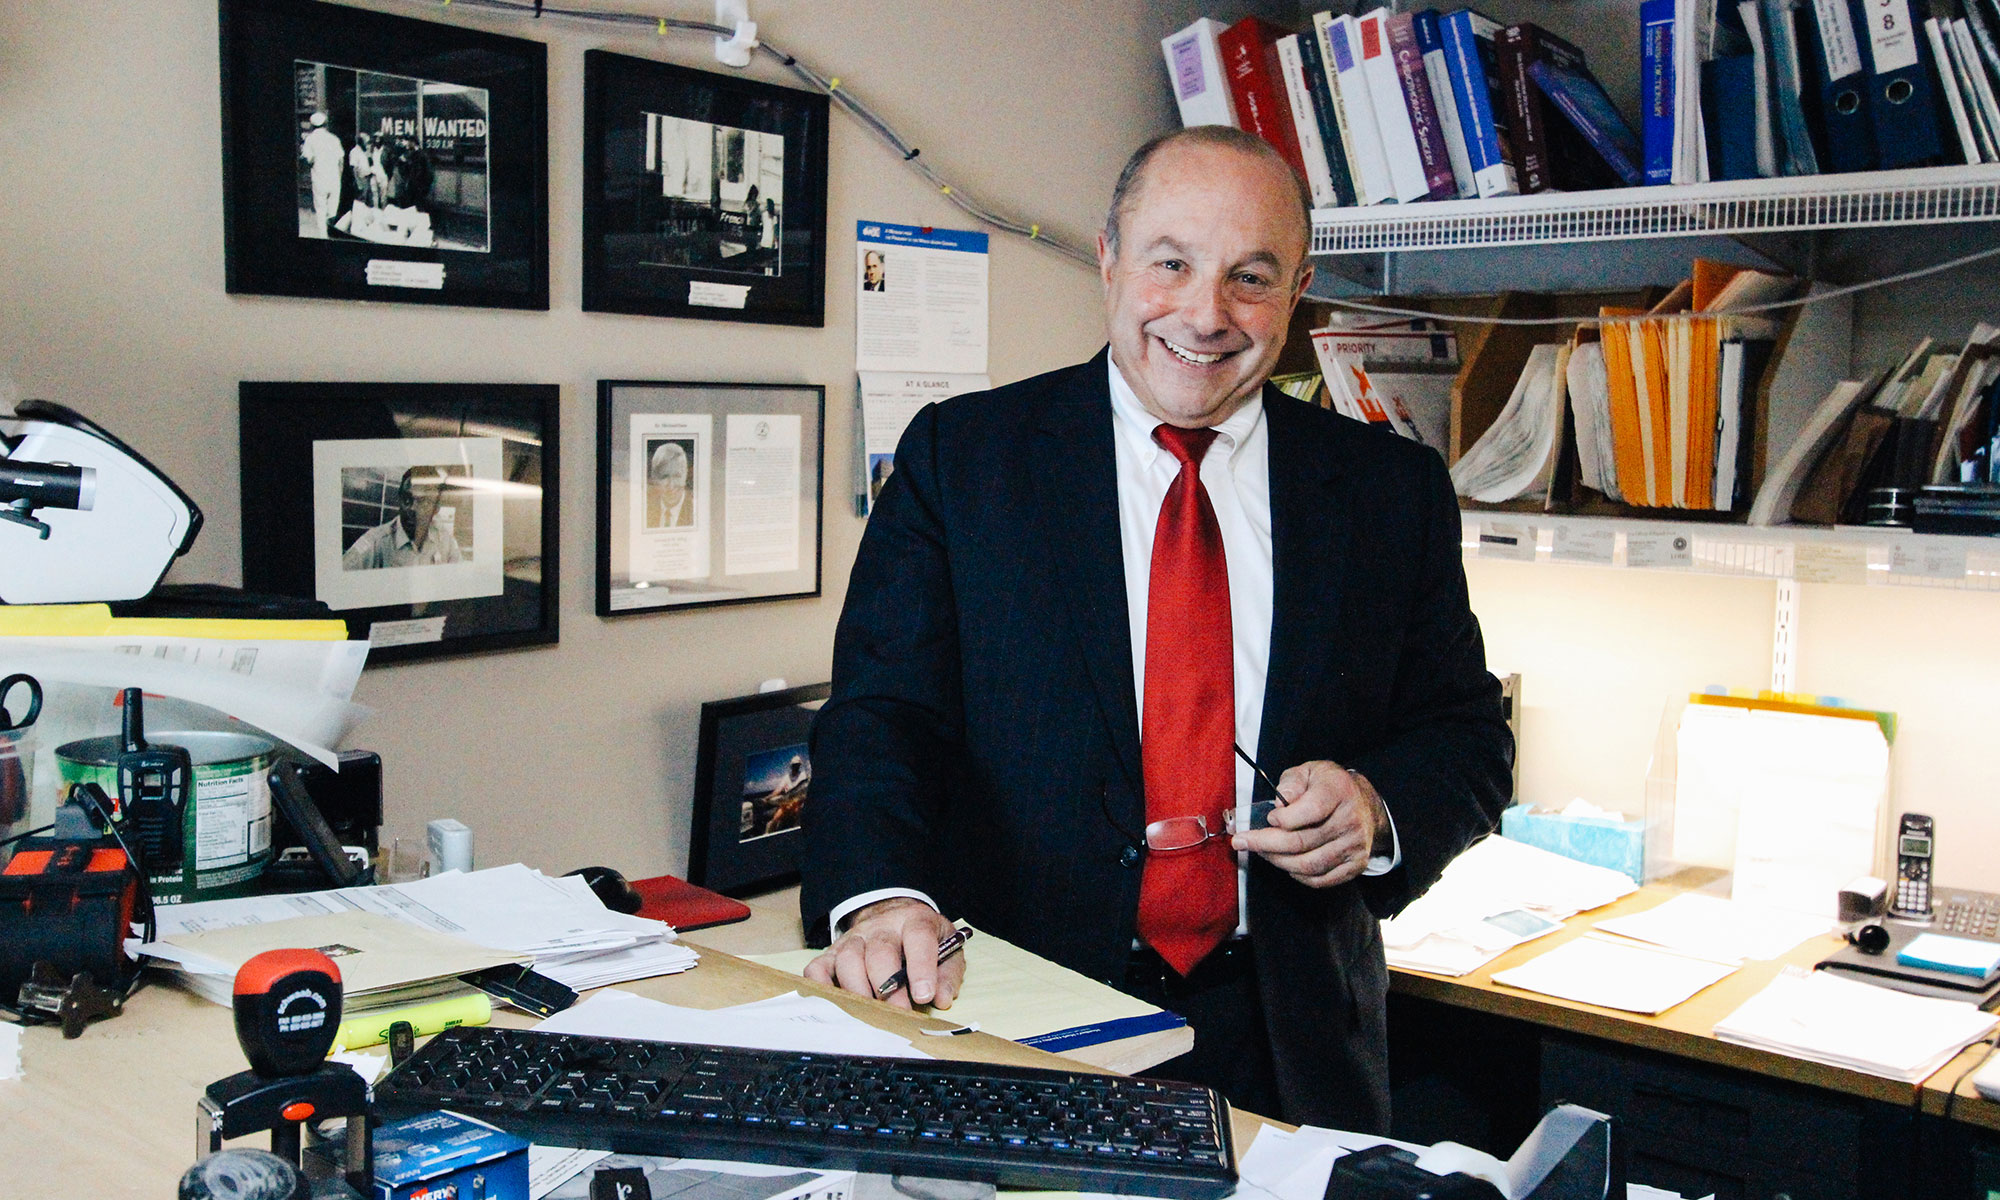 Law Office George M. Sachs, P.C.